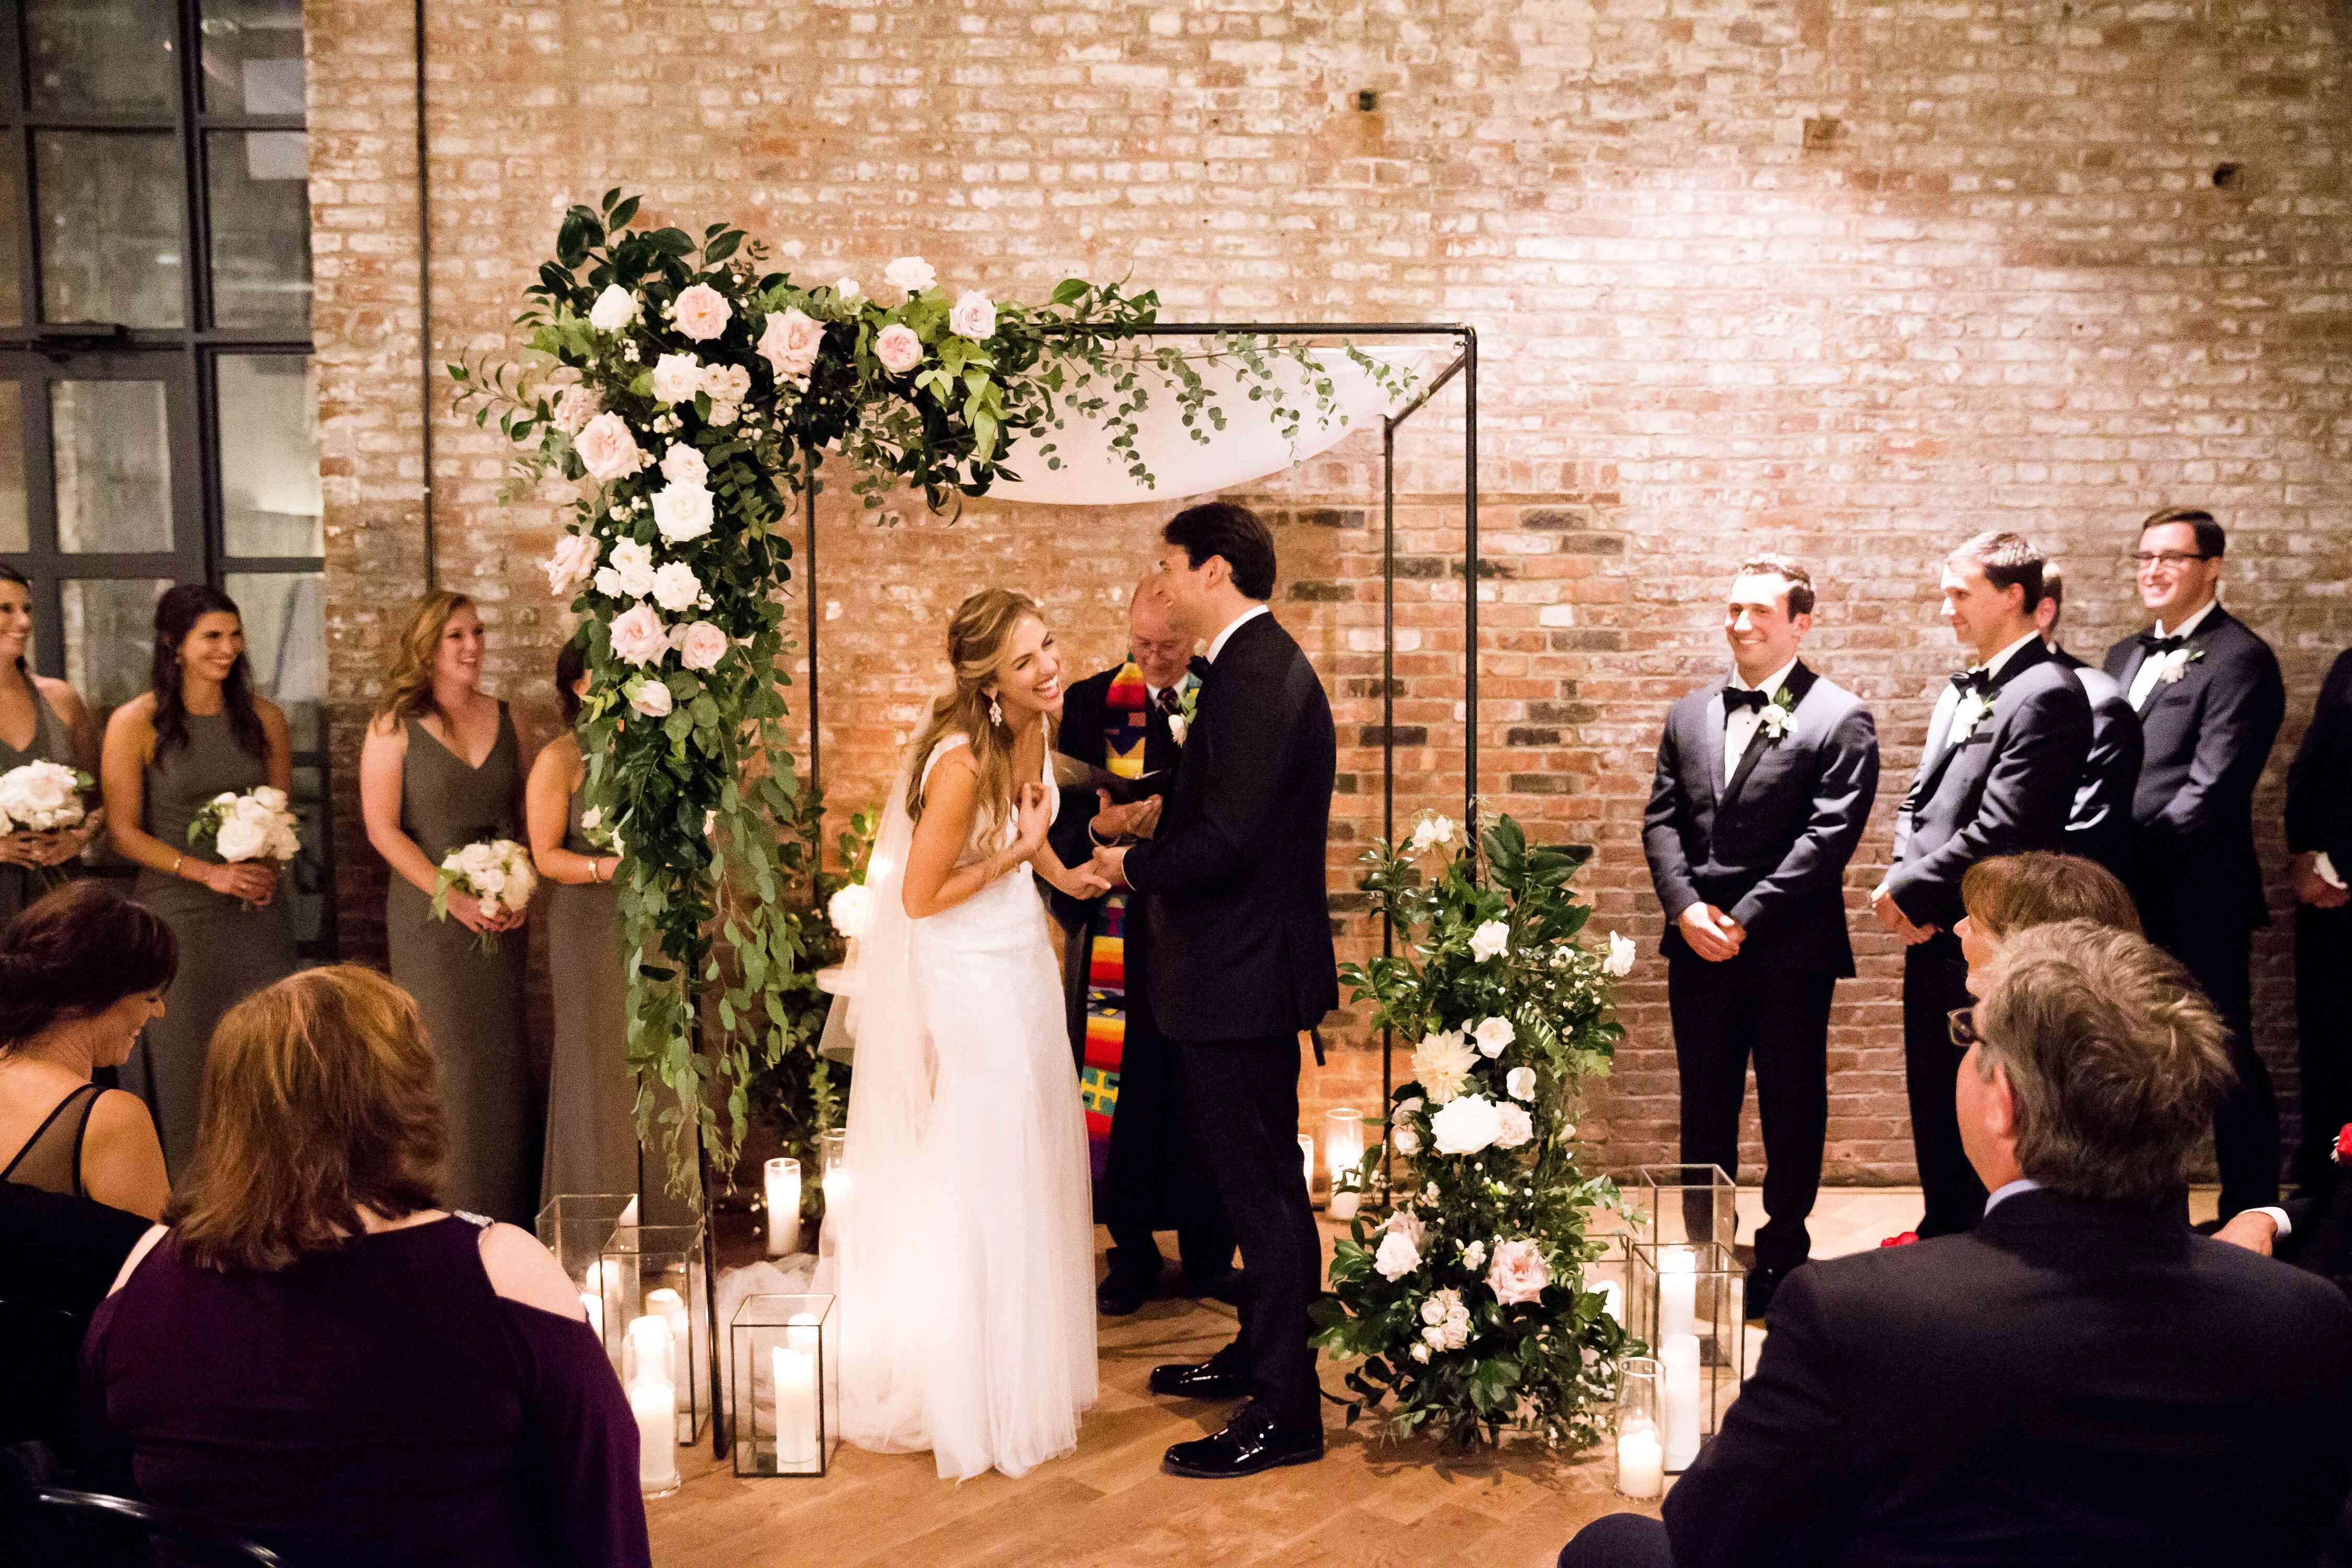 Jewish nuptial ceremony